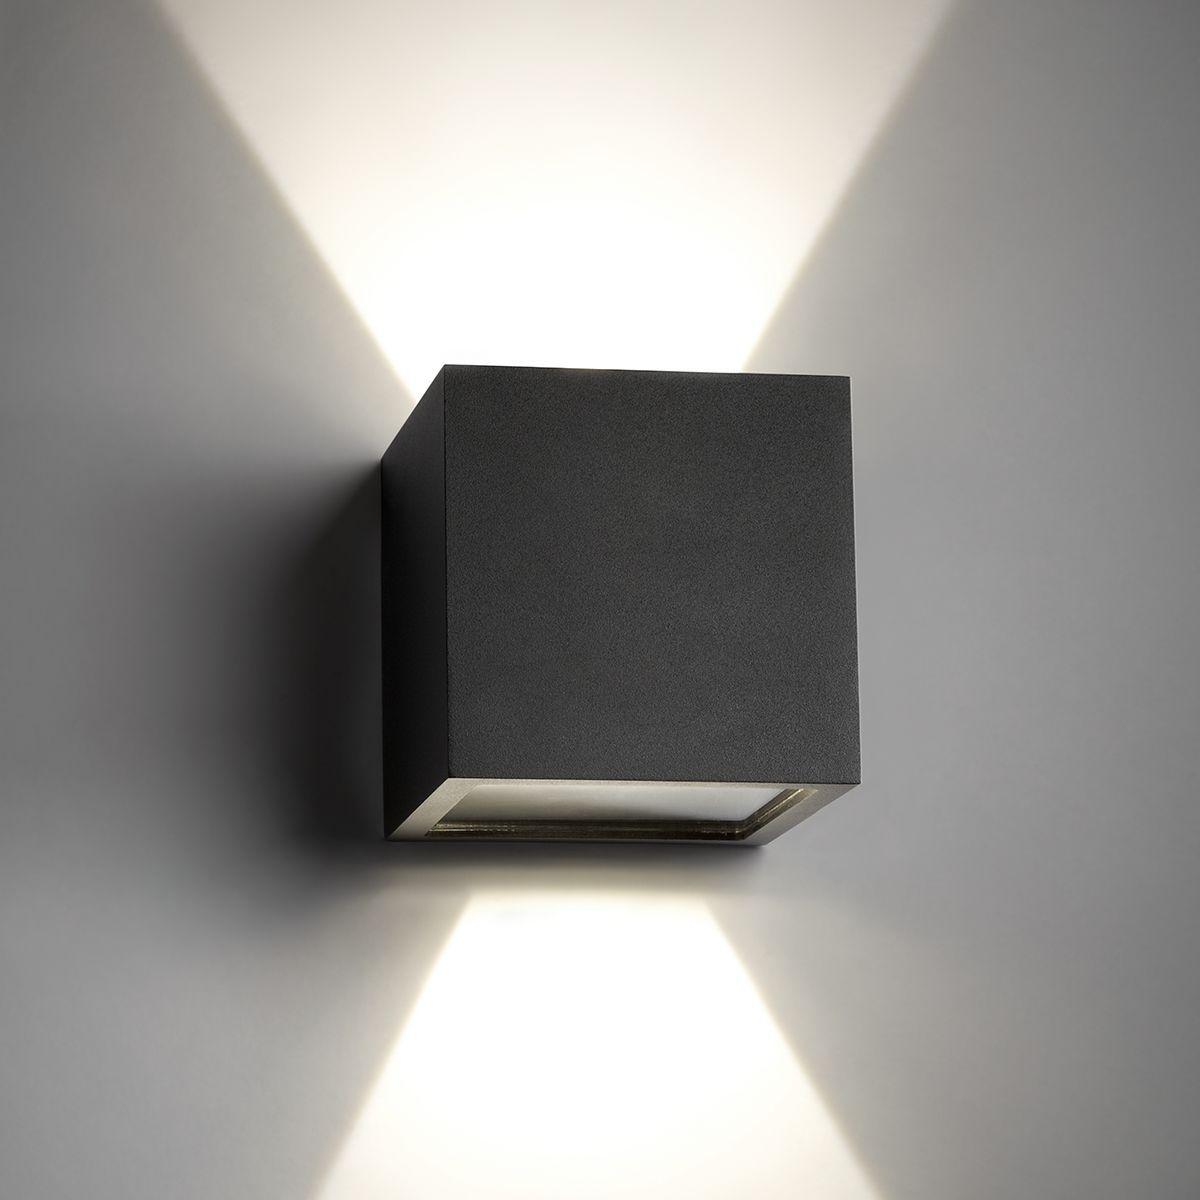 Contemporary wall light glass aluminum led cube by ronni gol point contemporary wall light glass aluminum led cube by ronni gol light aloadofball Choice Image